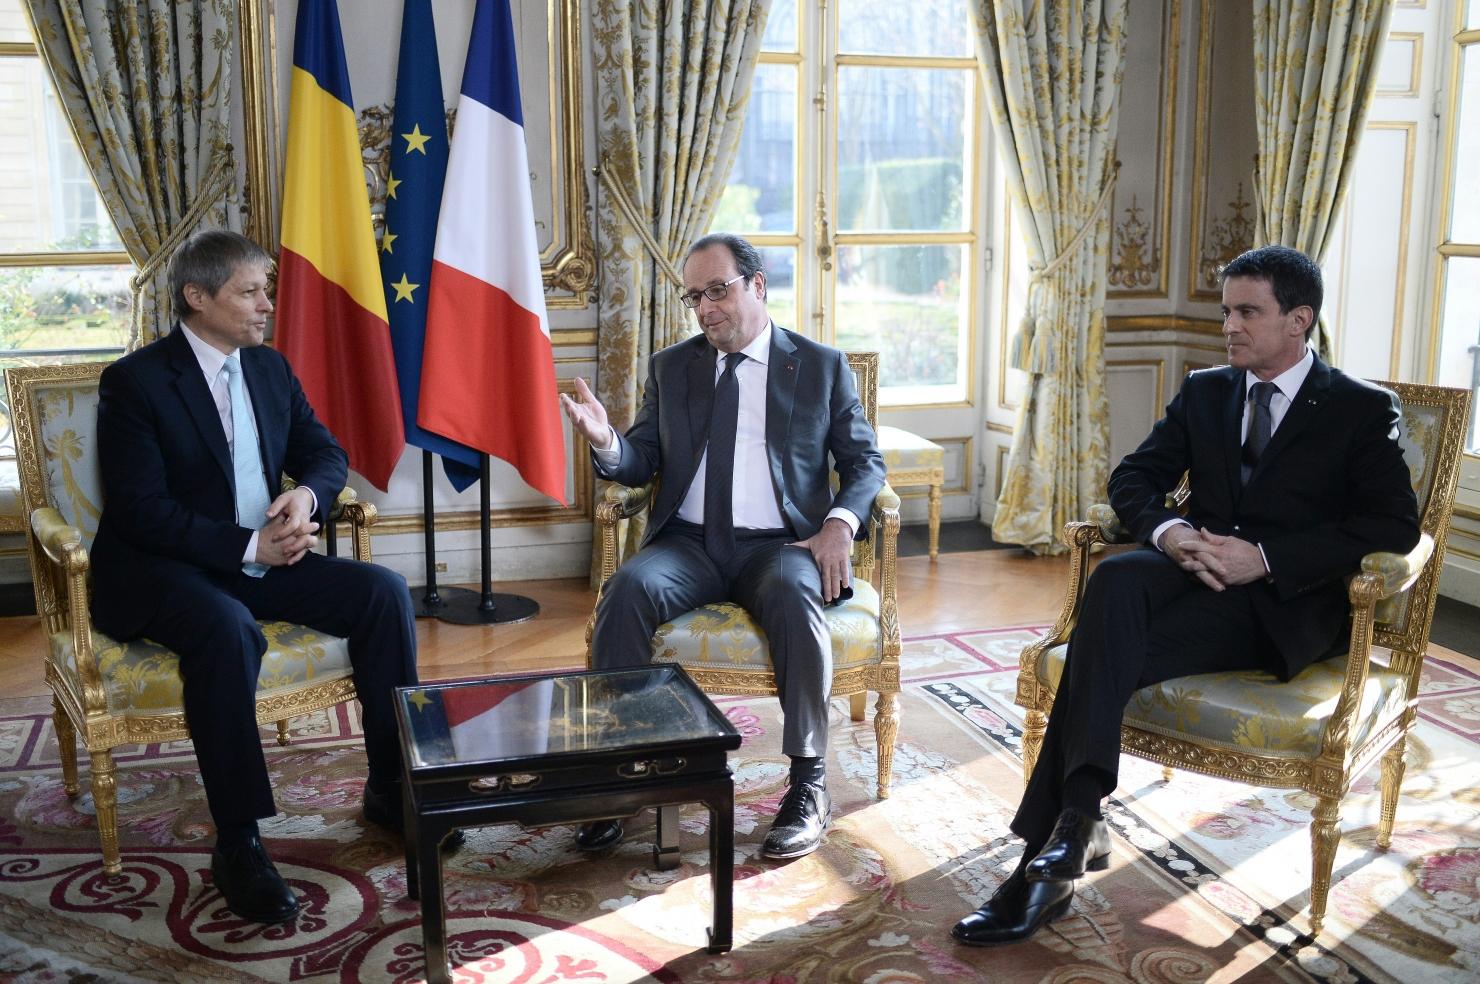 Premierul Manuel Valls, prezent la întâlnire